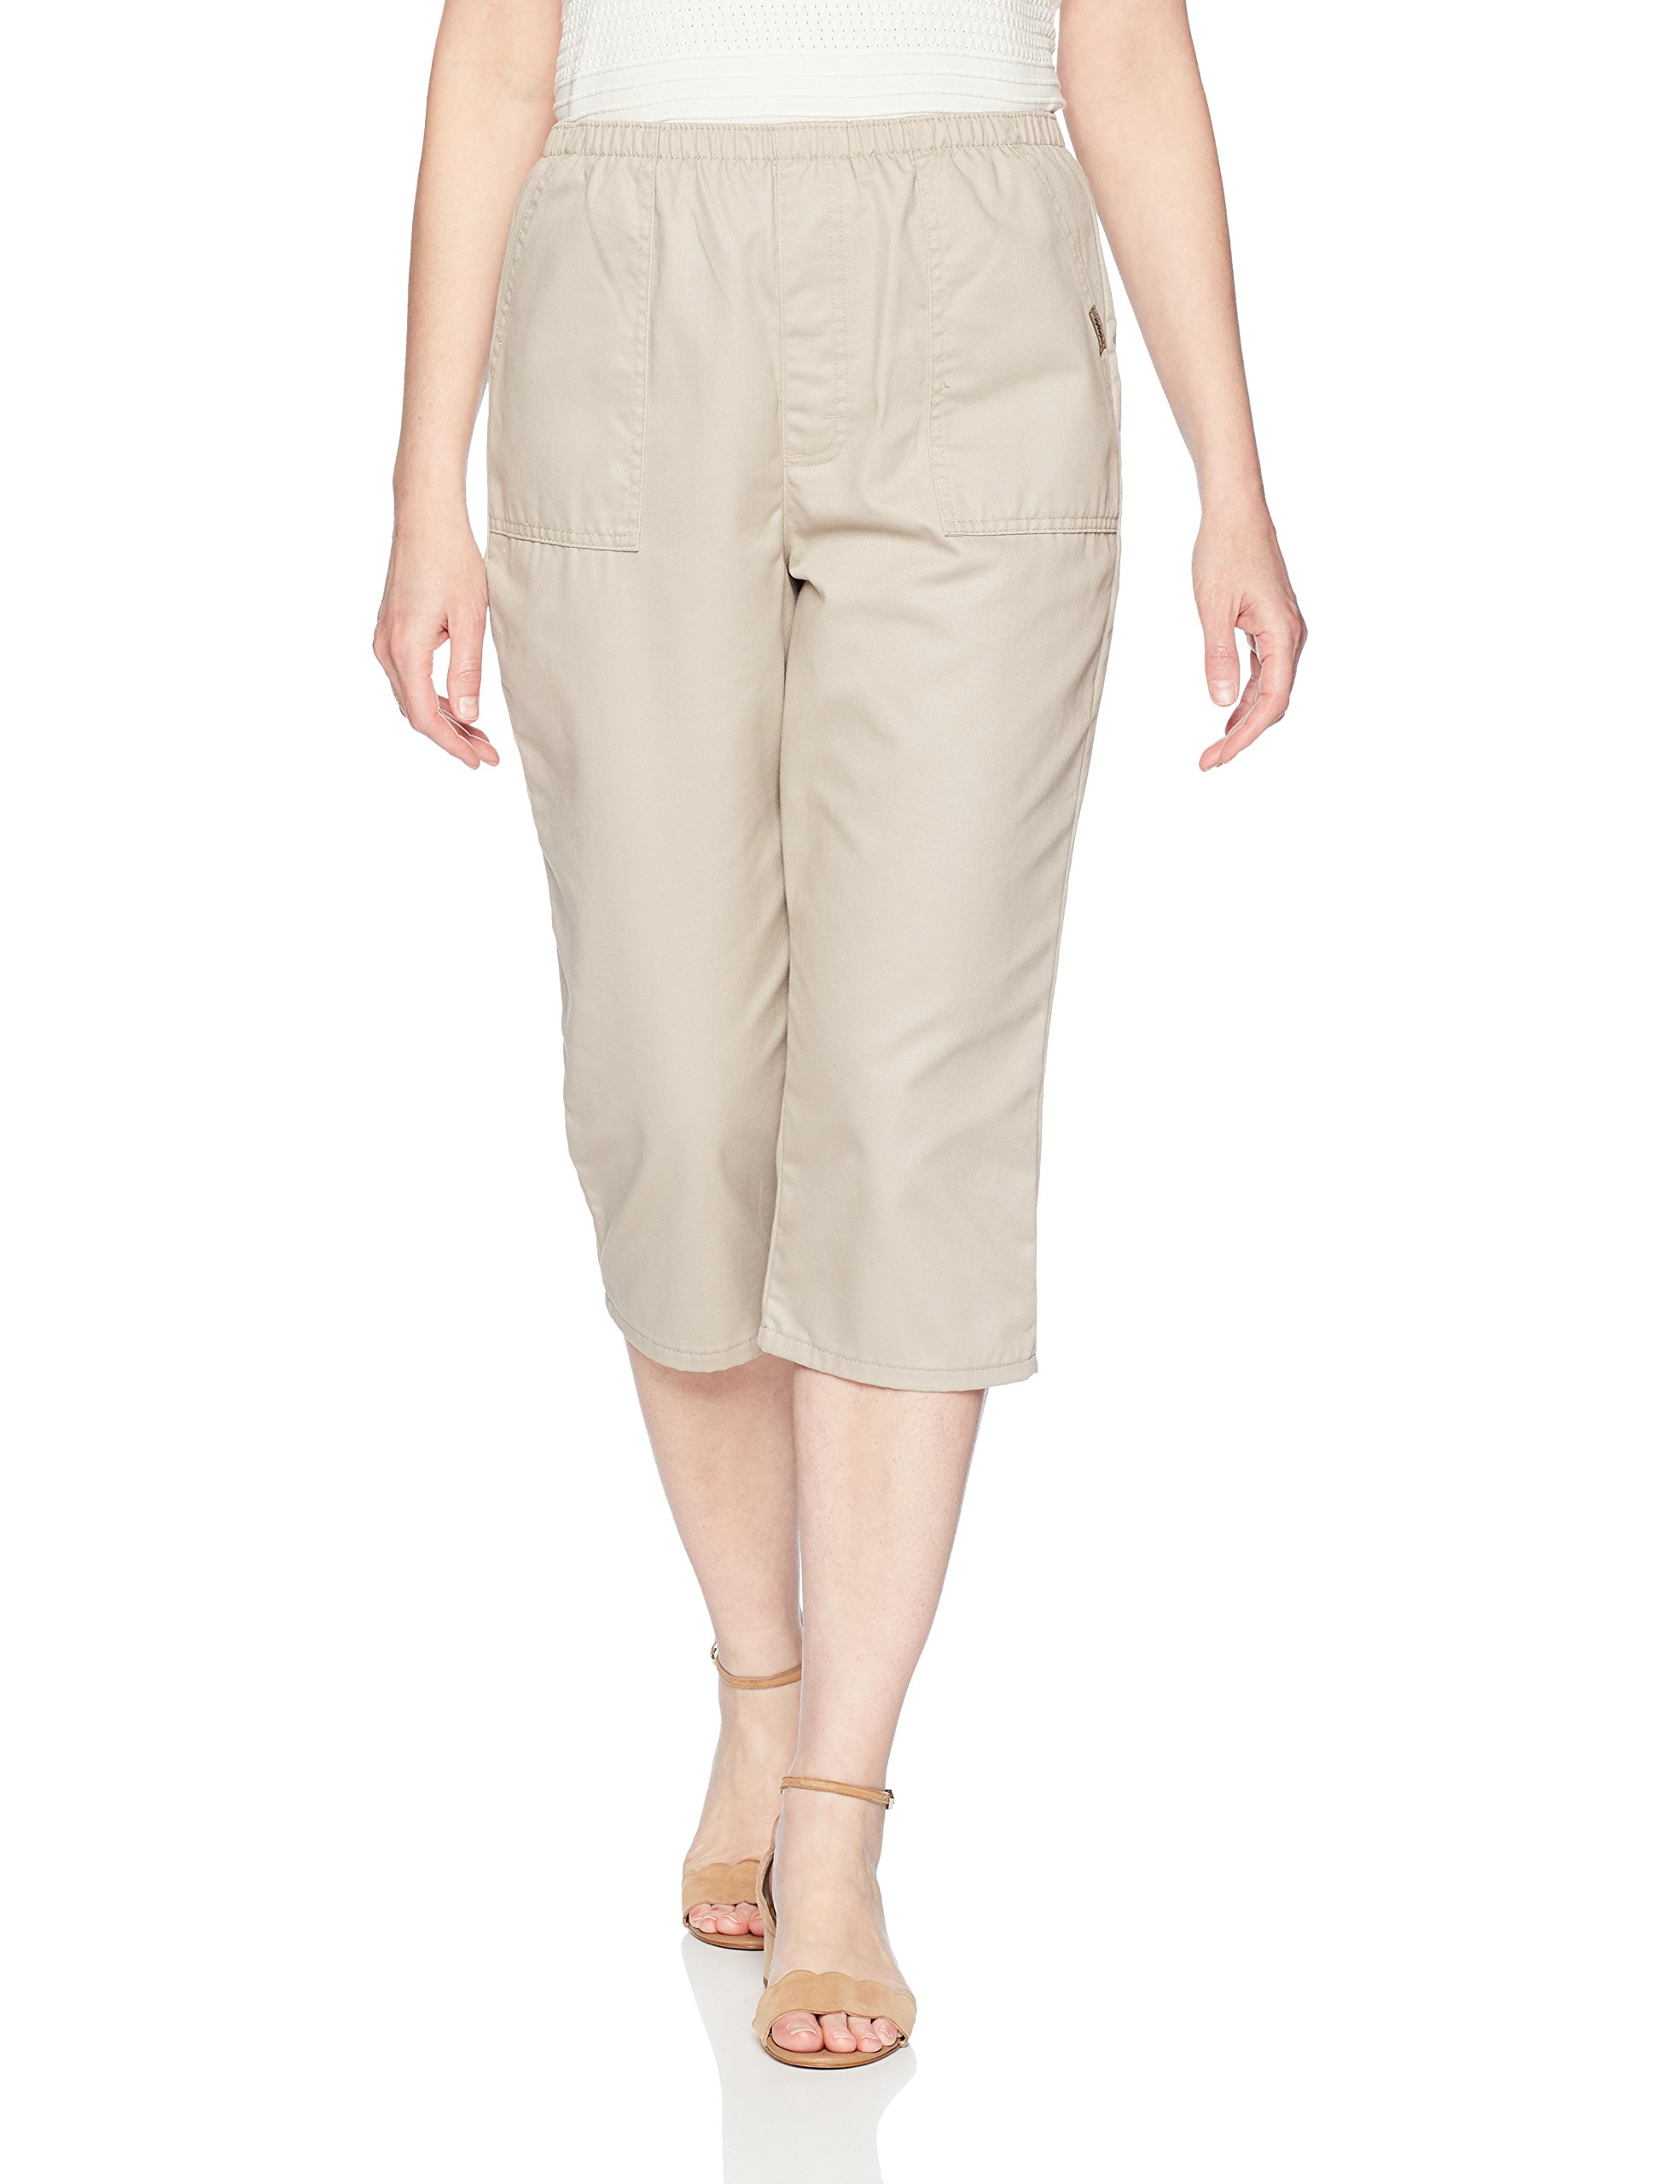 Chic Classic Collection Women's Cotton Pull-on Utility Pocket Capri with Elastic Waist, Khaki, 10 AVG